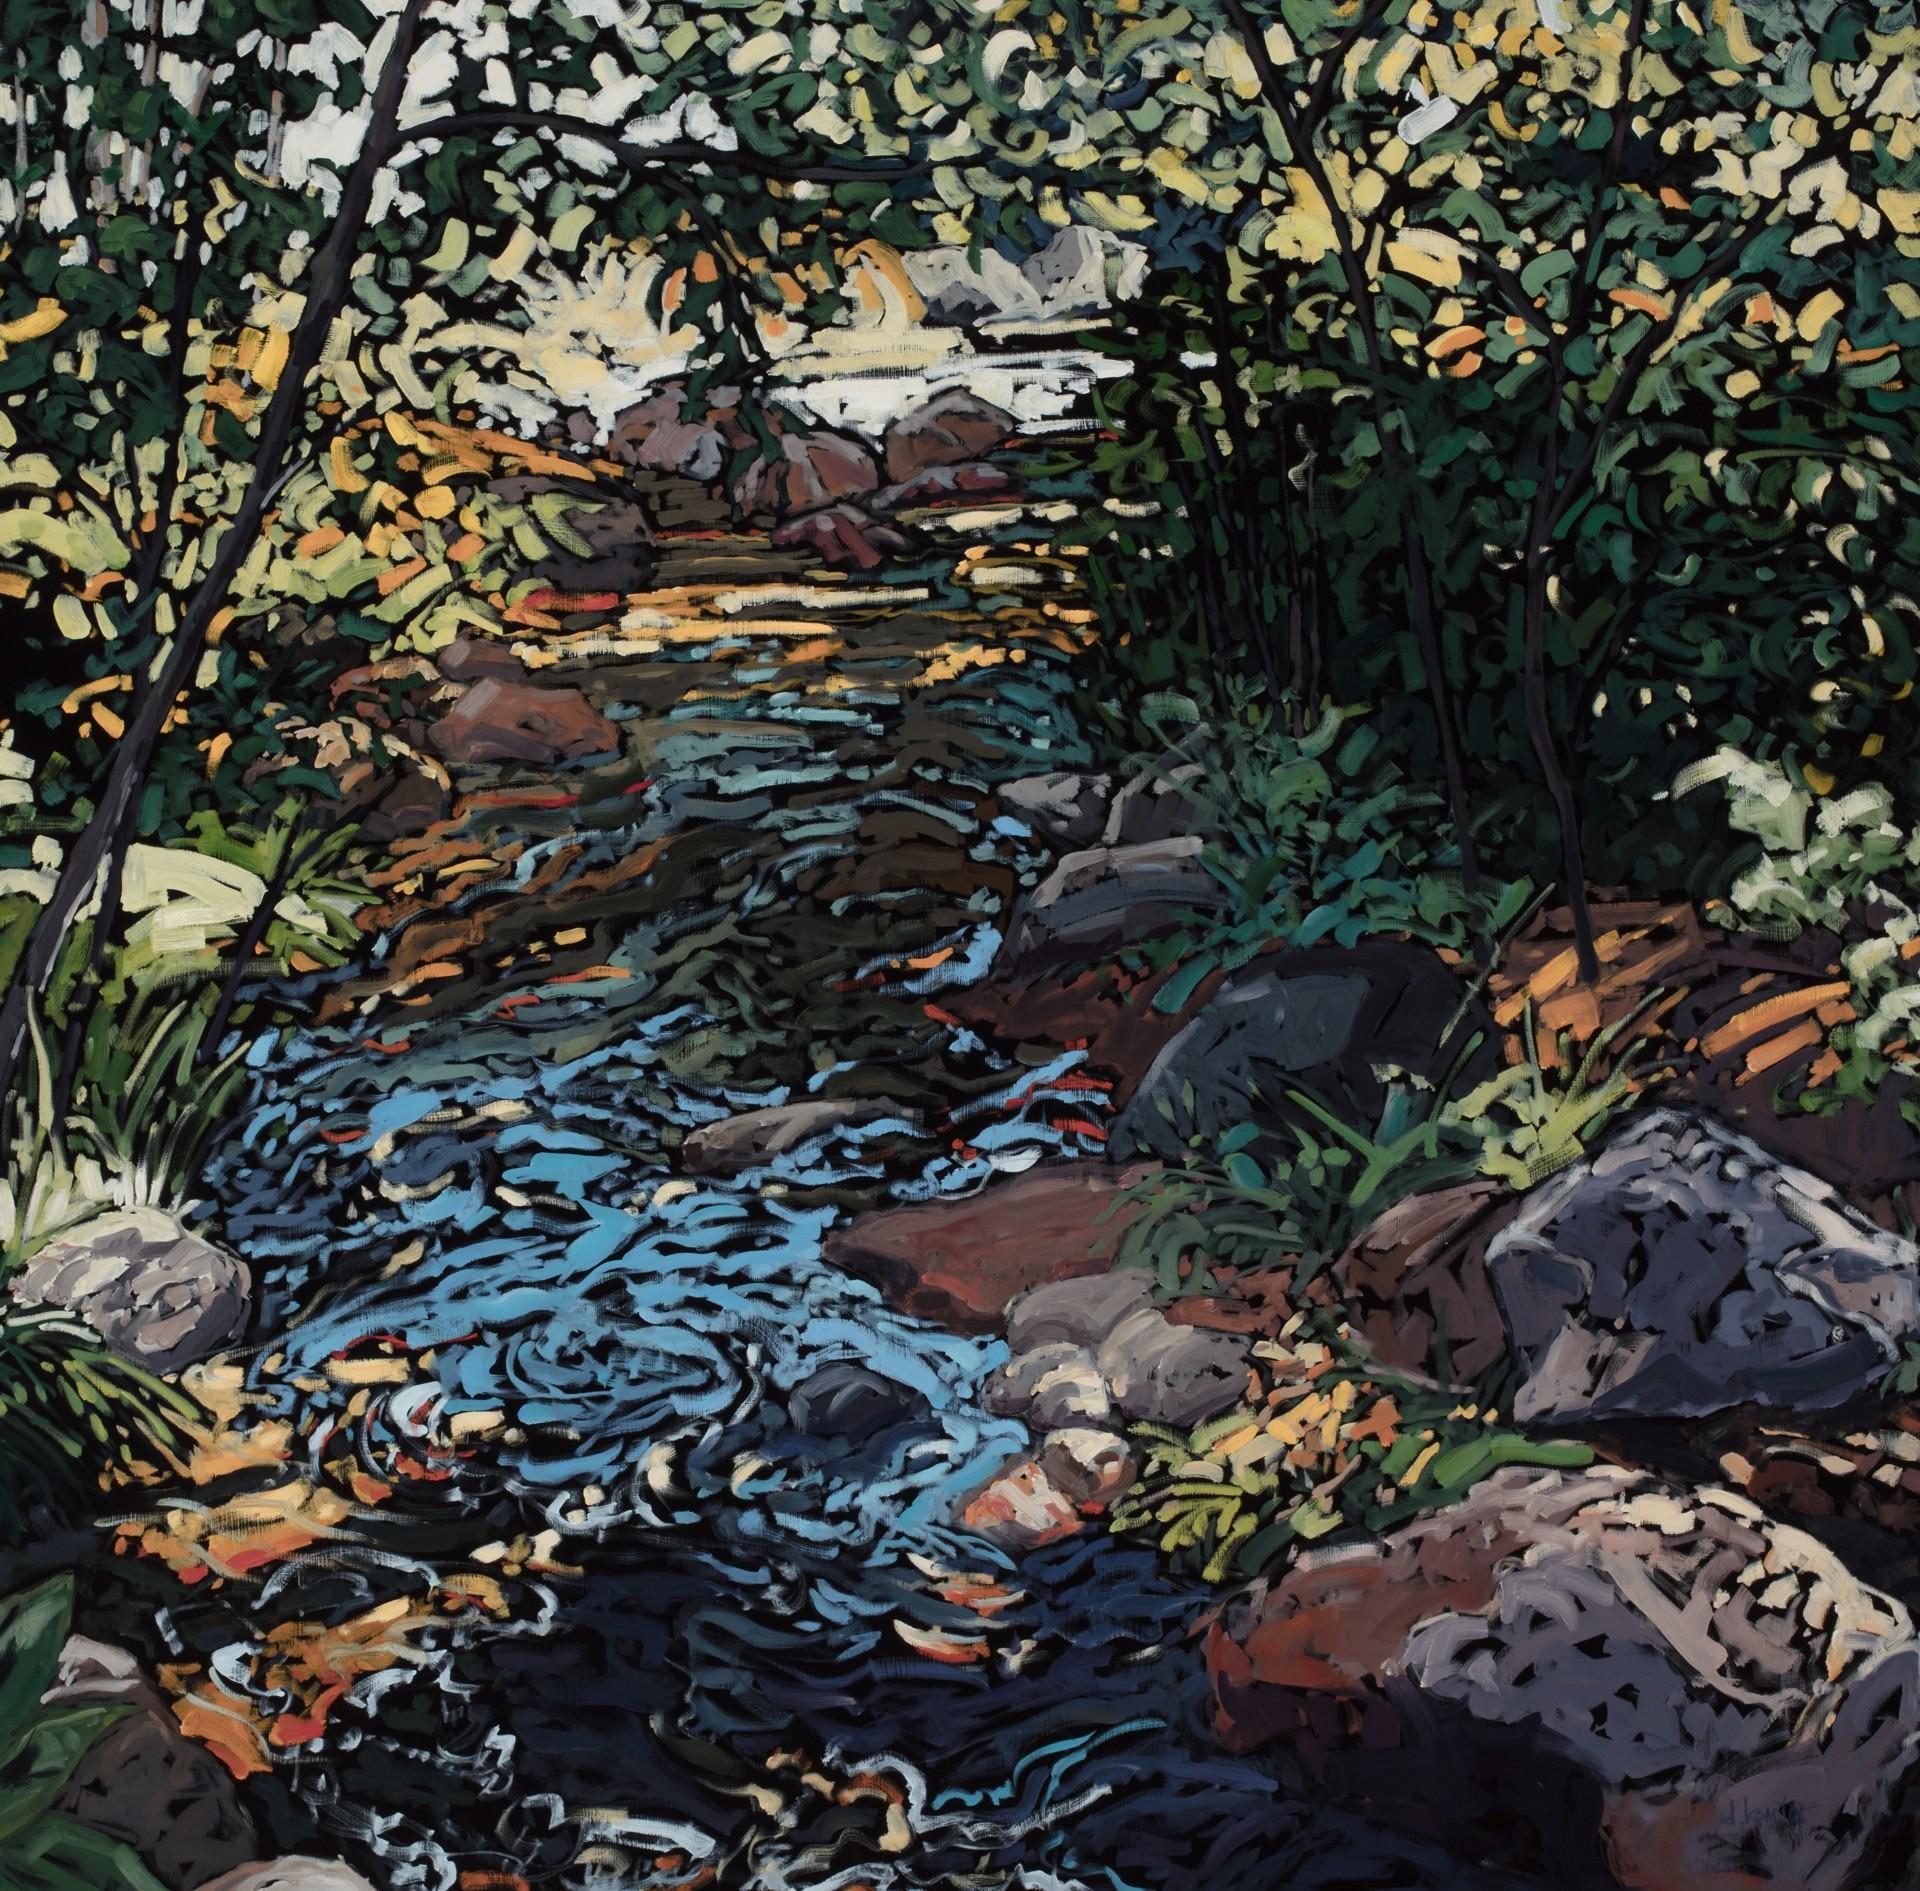 Autumn Rhapsody by Deb Komitor